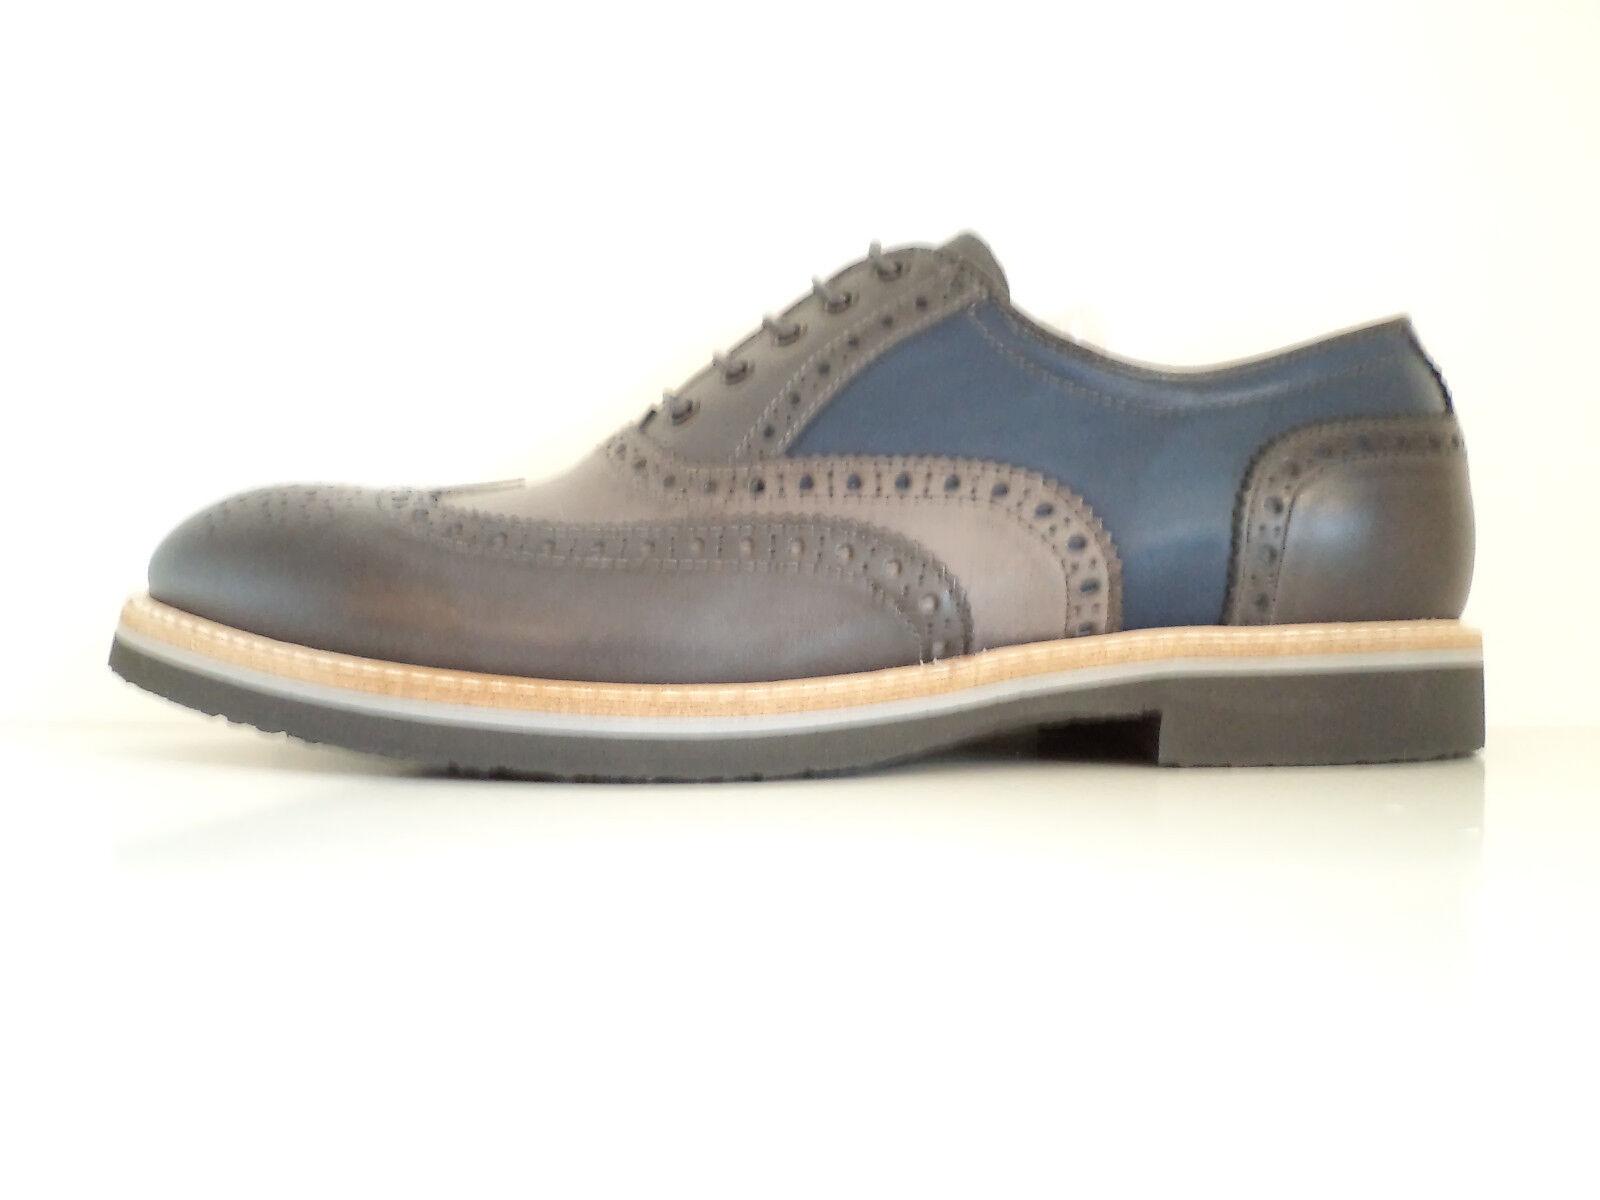 SCONTO 30 % shoes black GIARDINI SUMMER men  GREY ANTRAC blue ART. P800191